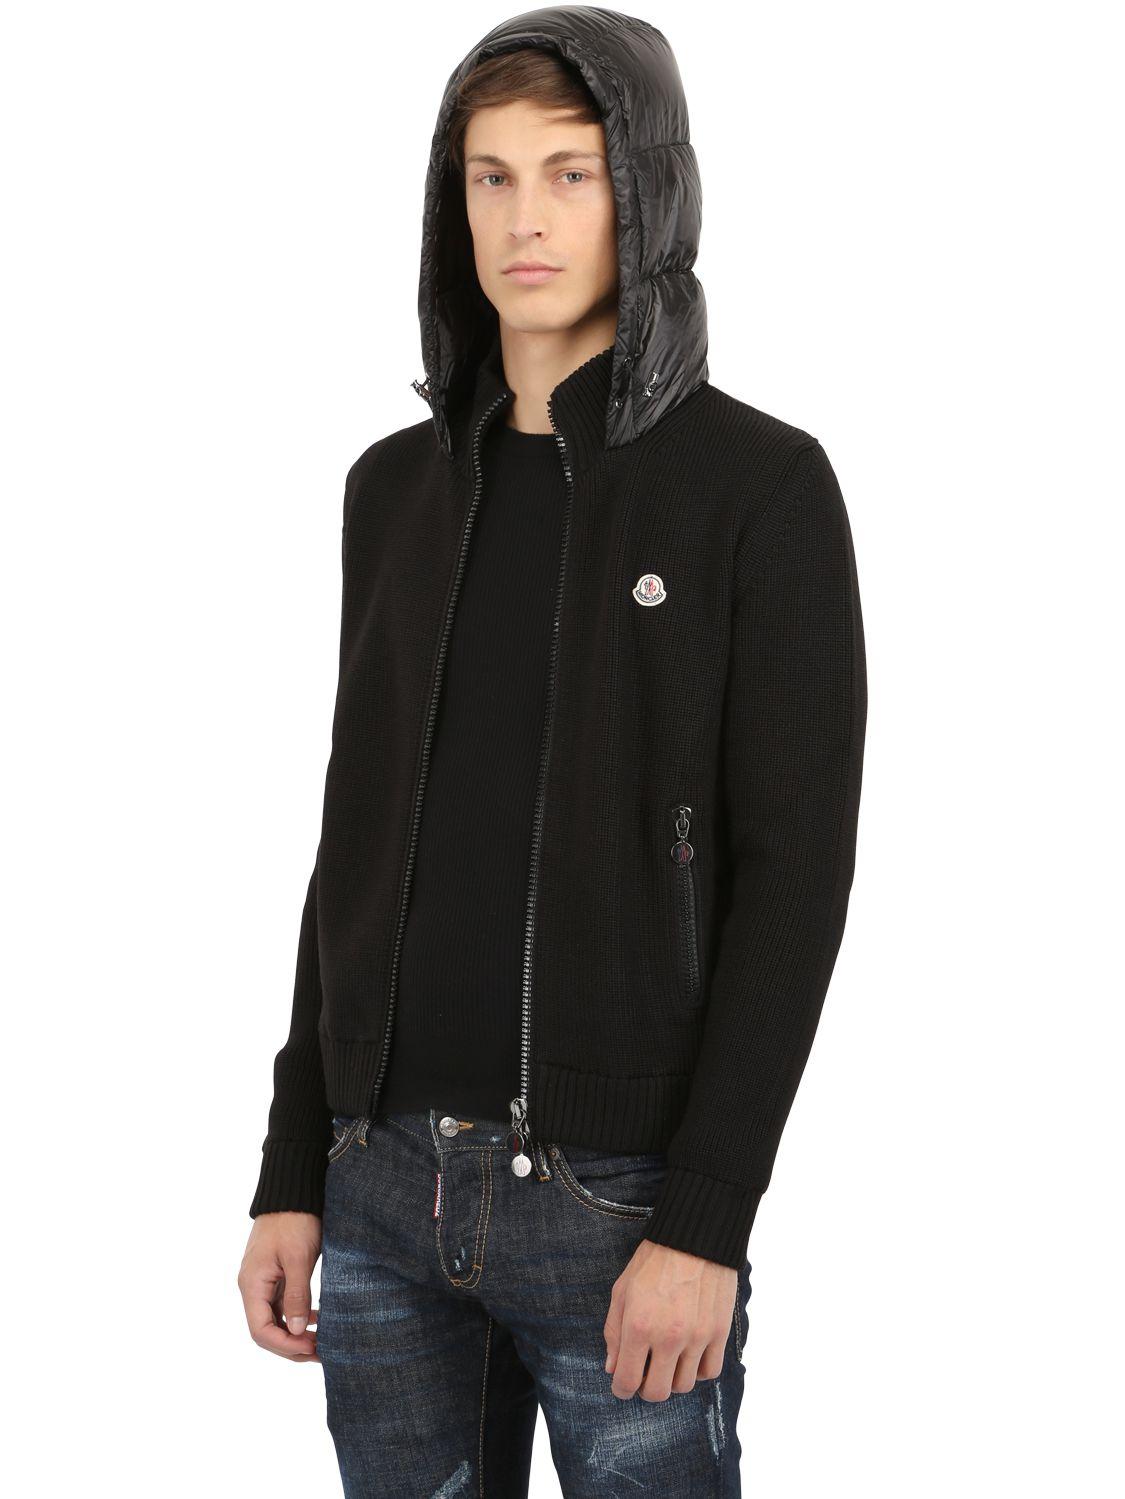 Moncler Hooded Nylon Wool Knit Down Jacket in Black for Men